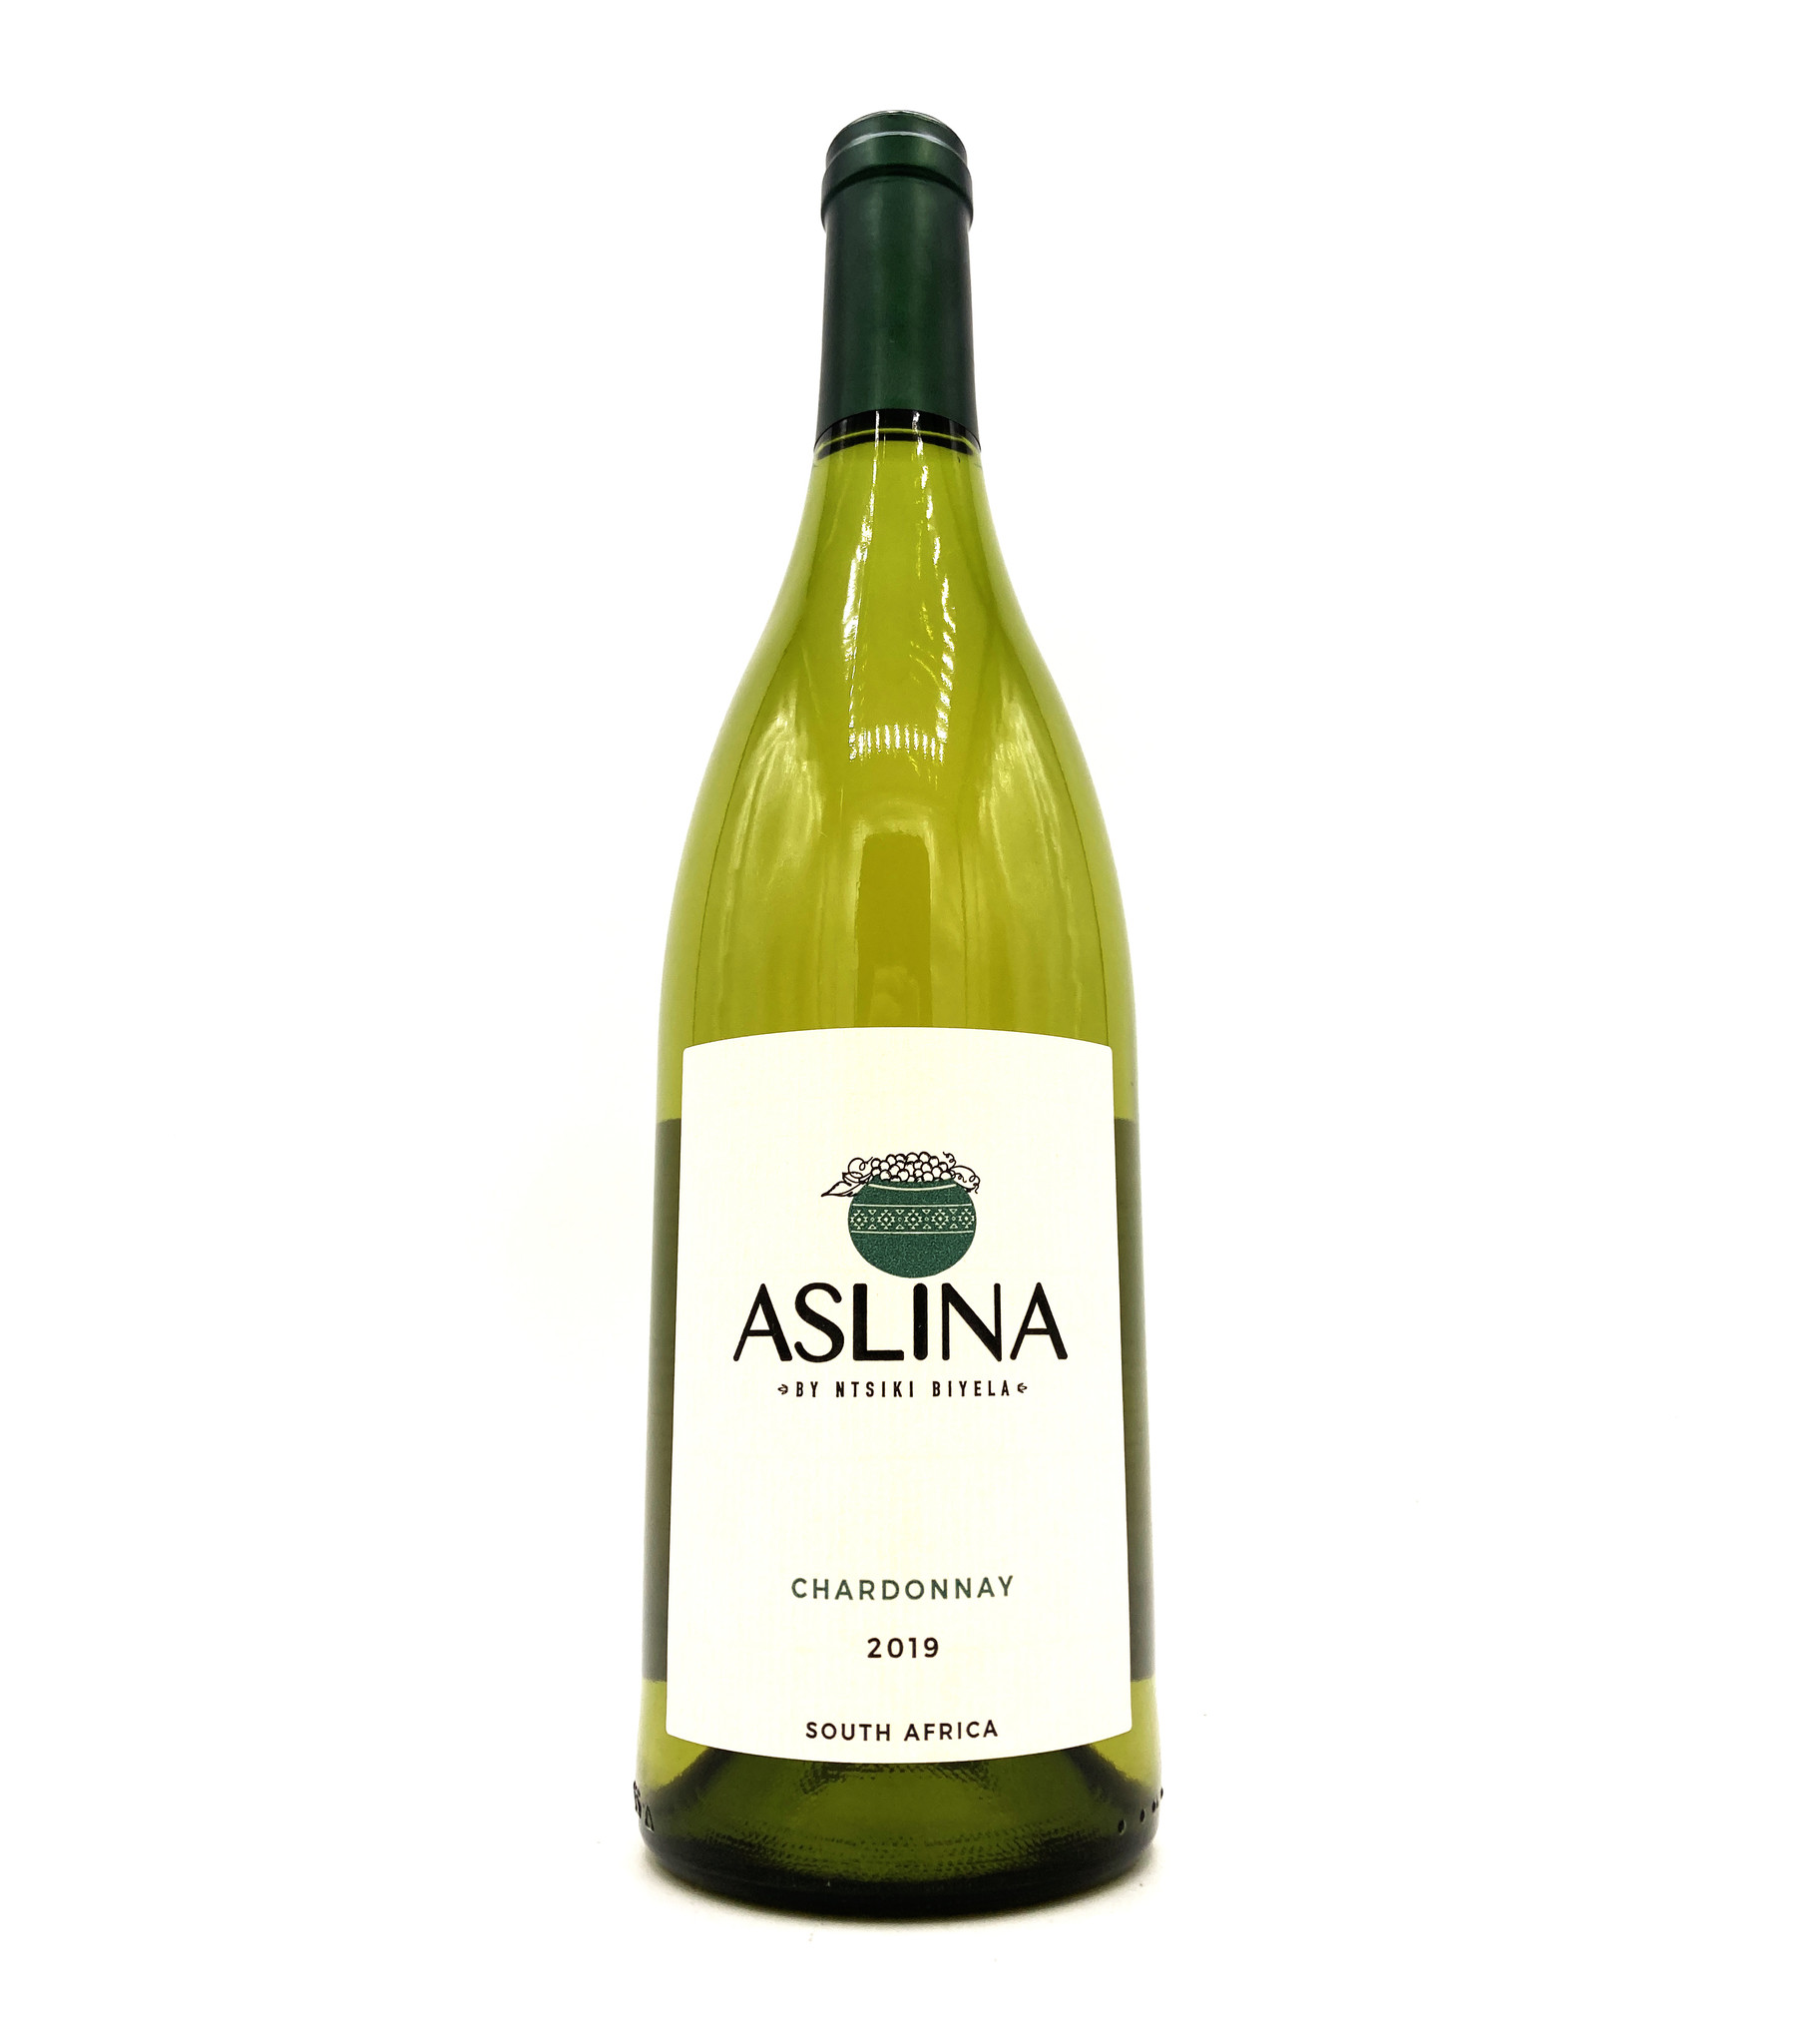 Chardonnay 2019 Aslina by Ntsiki Biyela